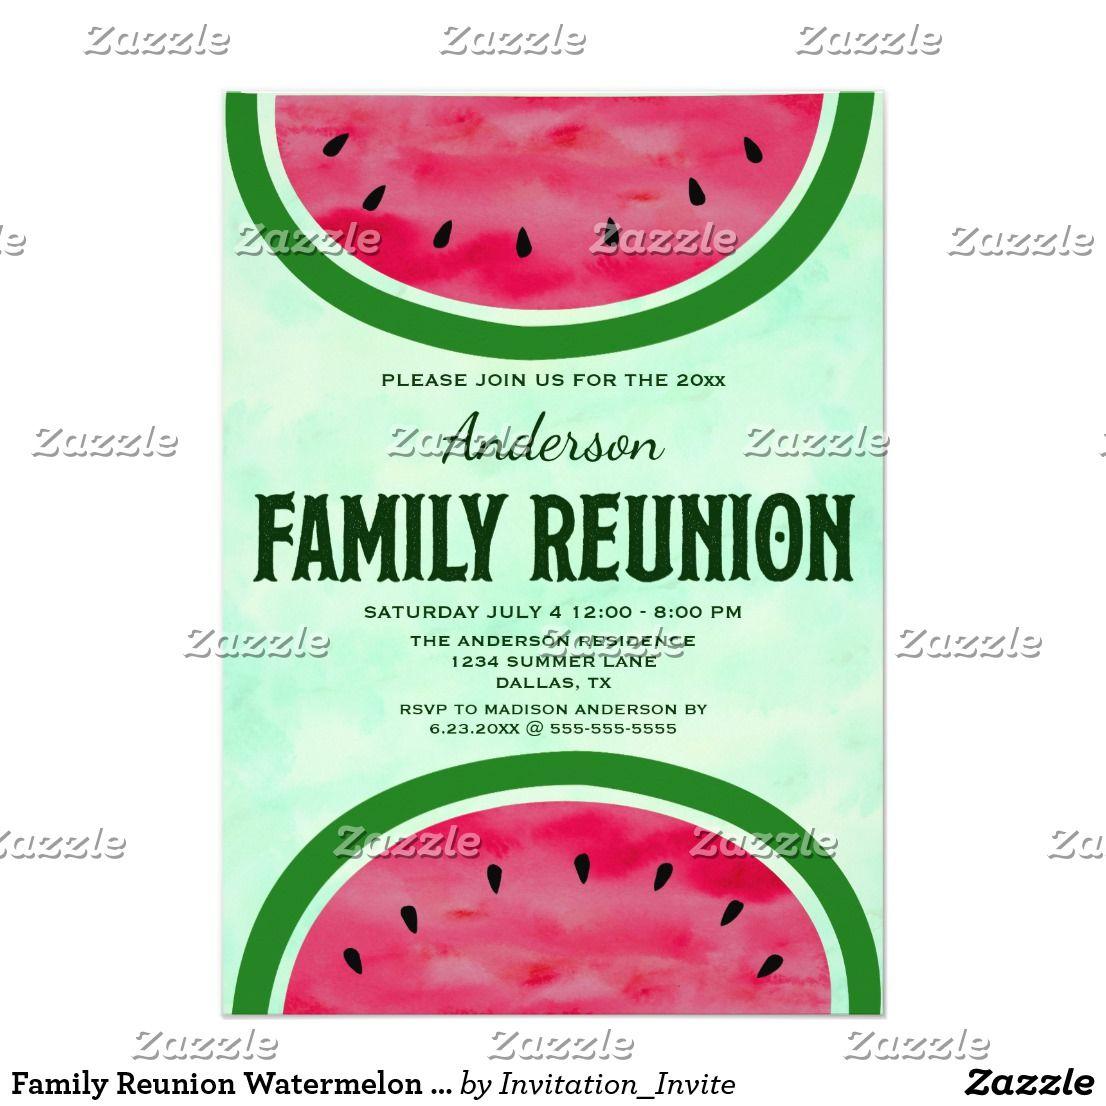 Family Reunion Watermelon Halves Invitation This family reunion ...